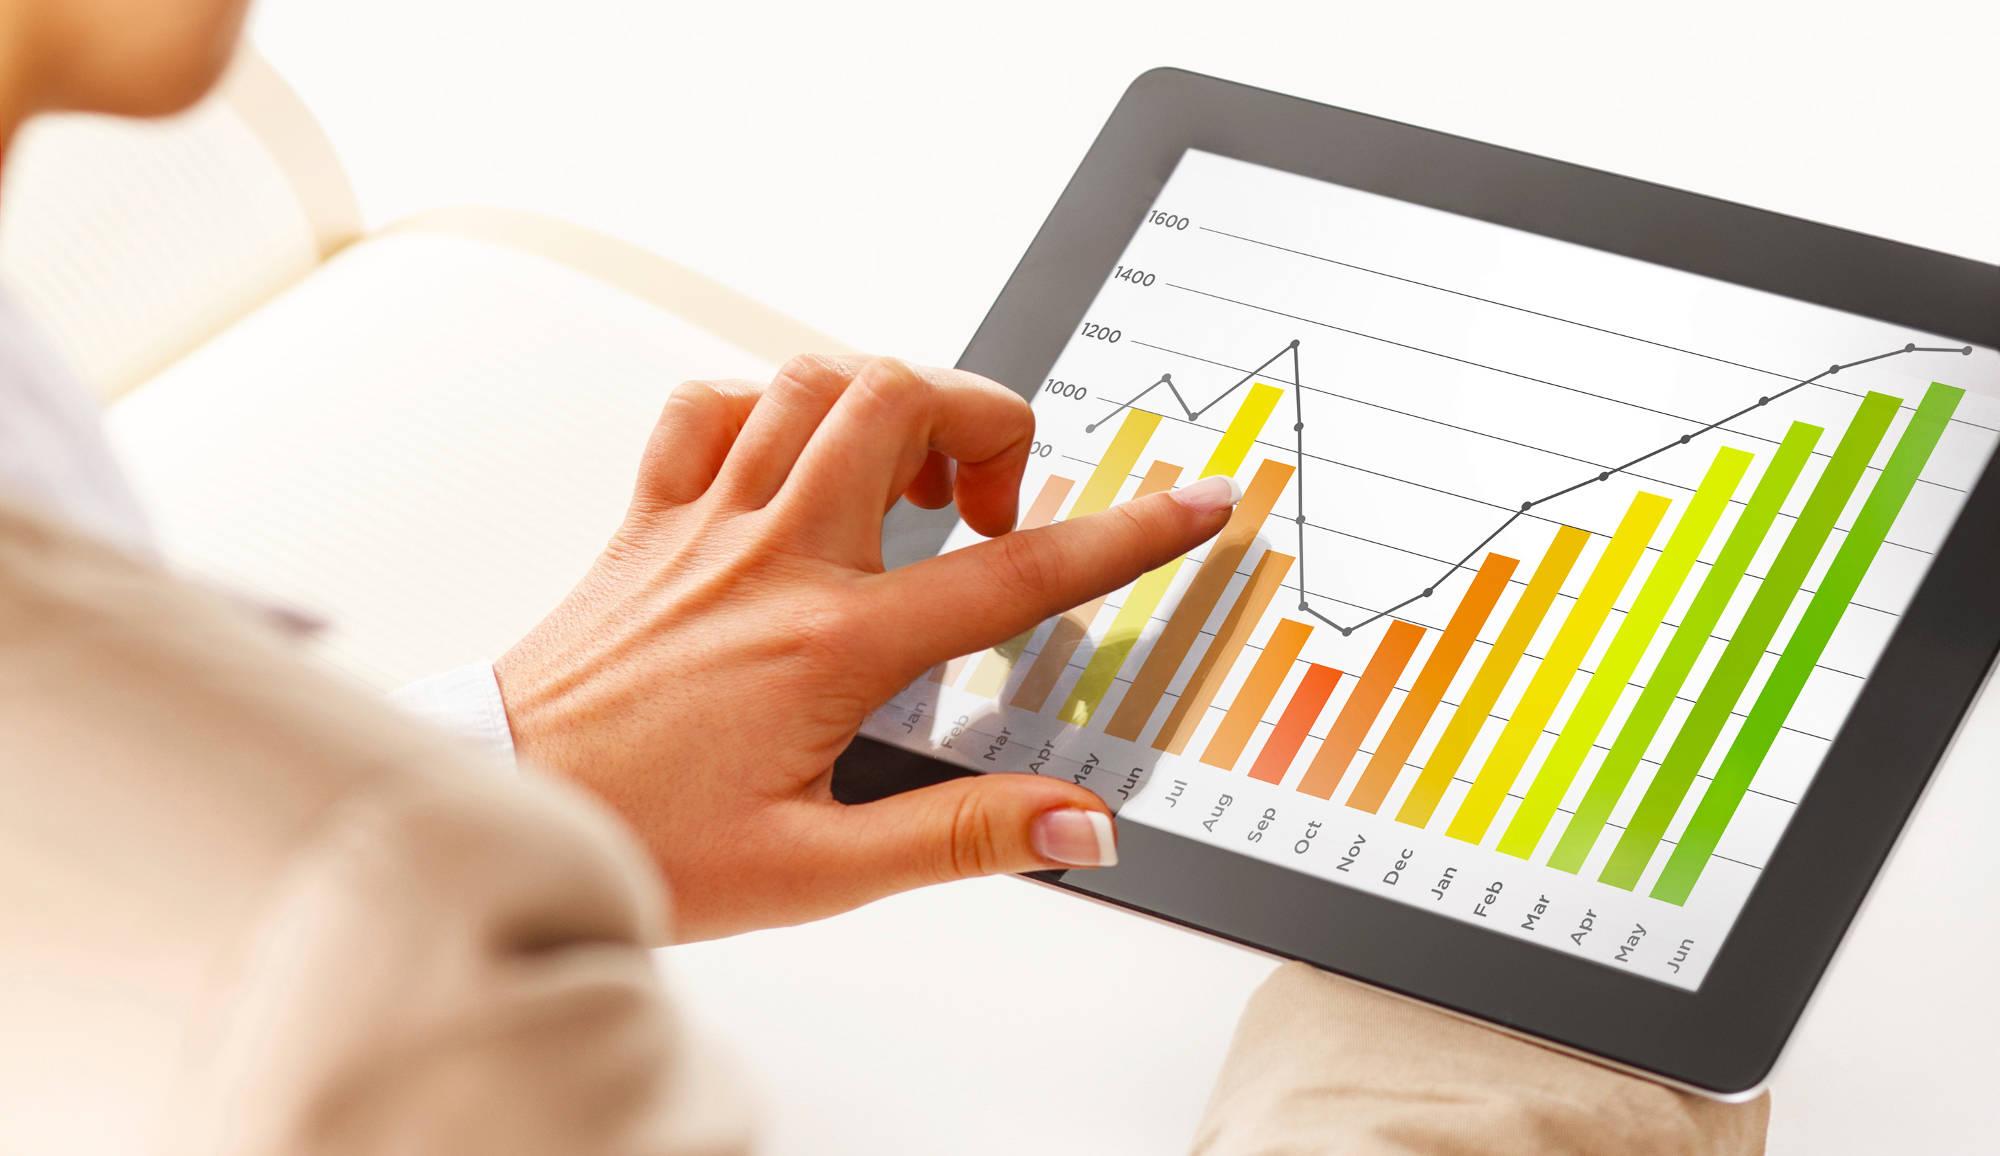 Hasil gambar untuk Tips Cara Menaikan Rating SEO Website di Google Dengan Cepat